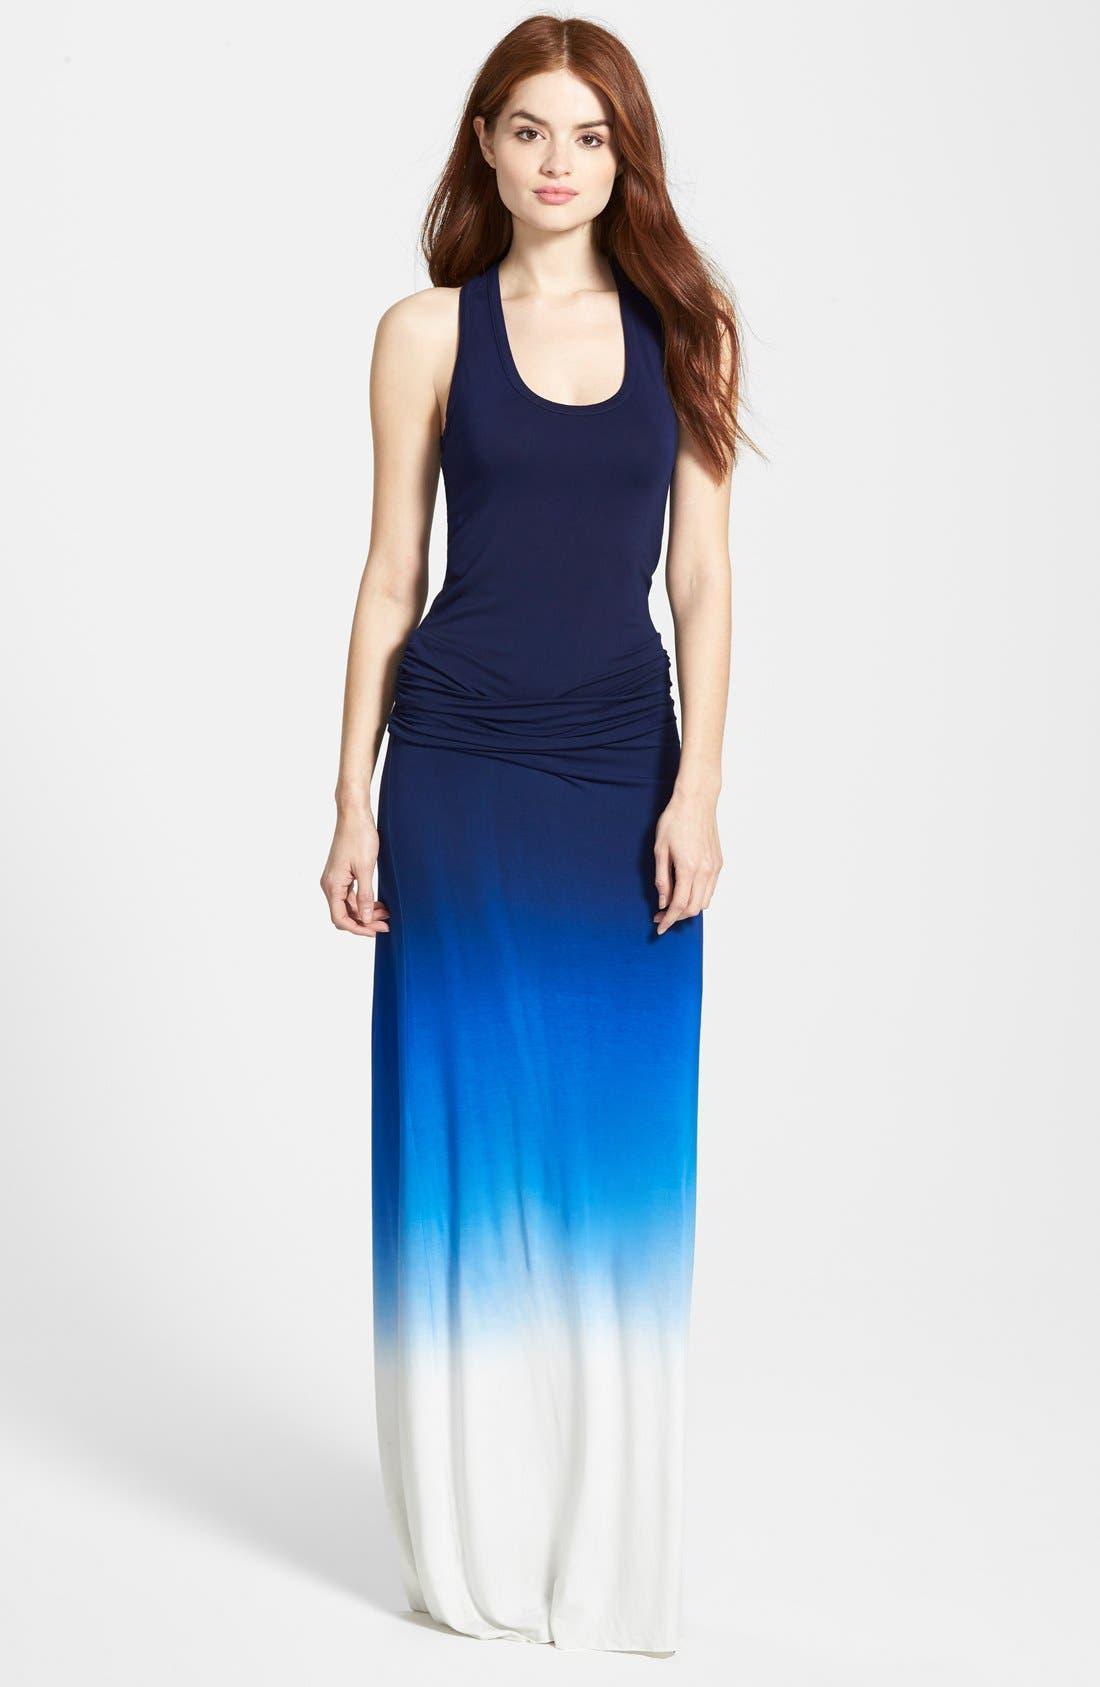 Main Image - Young, Fabulous & Broke 'Hamptons' Maxi Dress